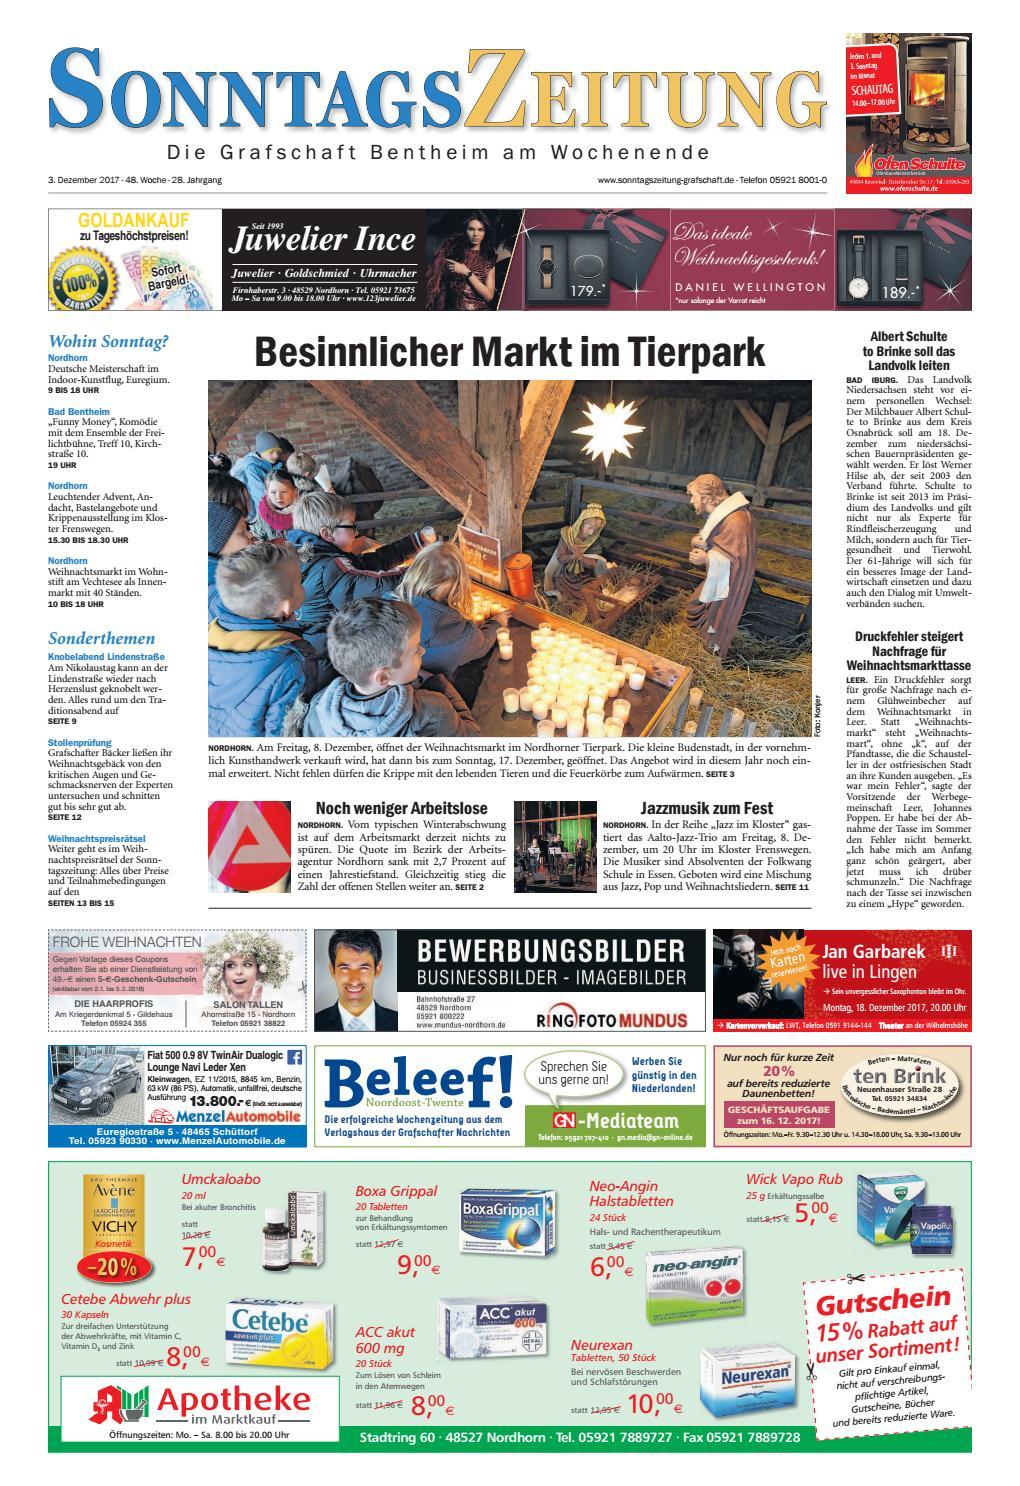 SonntagsZeitung_03-12-2017 by SonntagsZeitung - issuu